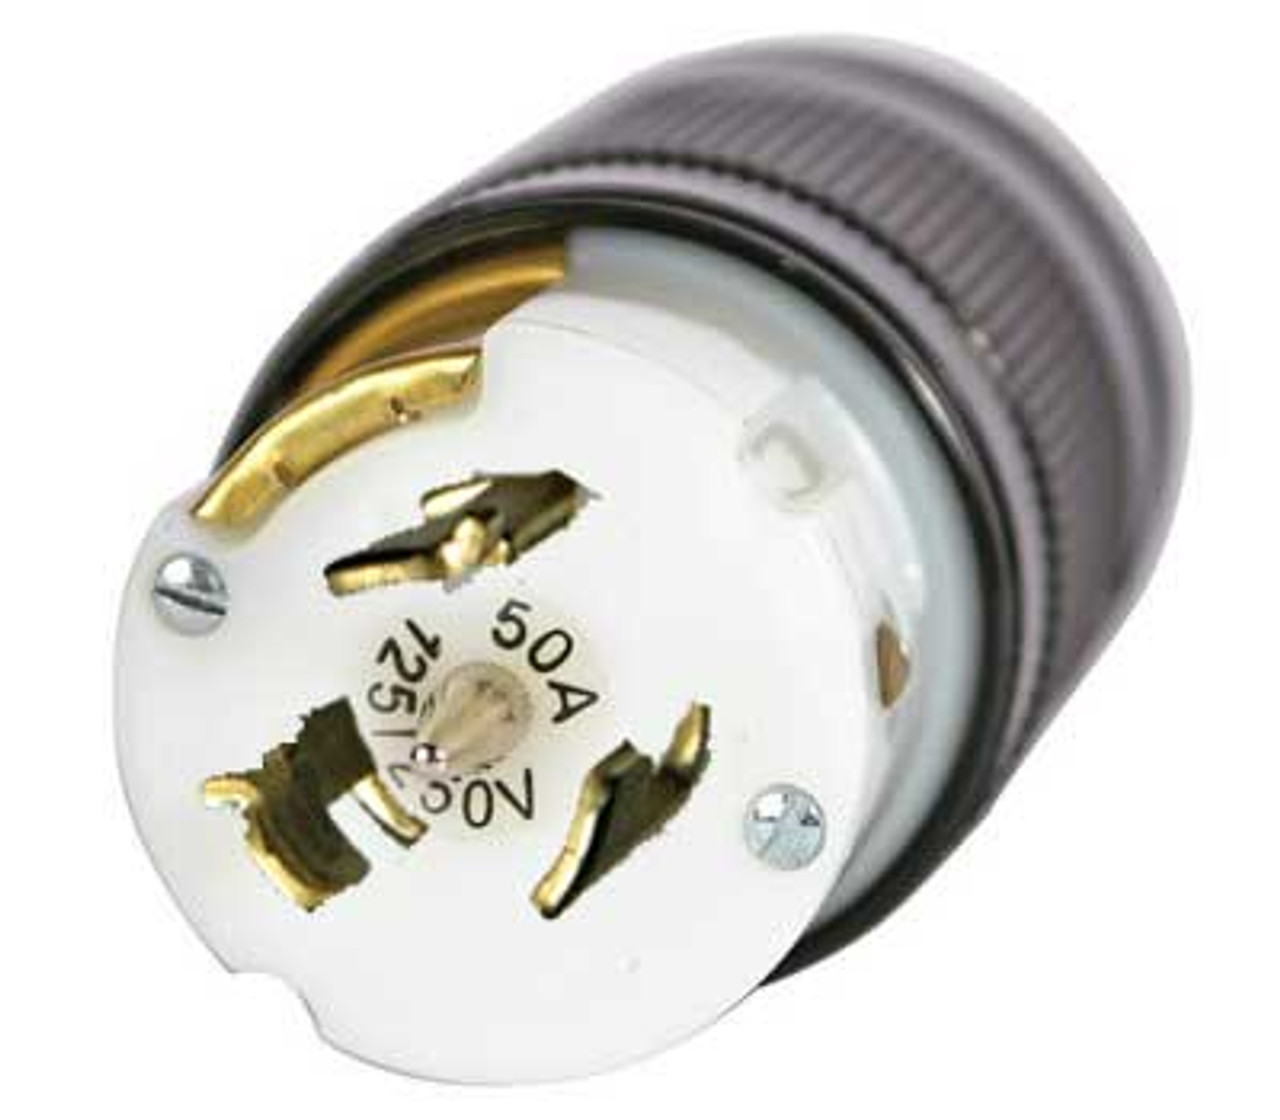 LEX 50 Amp 125/250 VAC California Style Locking Plug  Amp Plug Wiring on